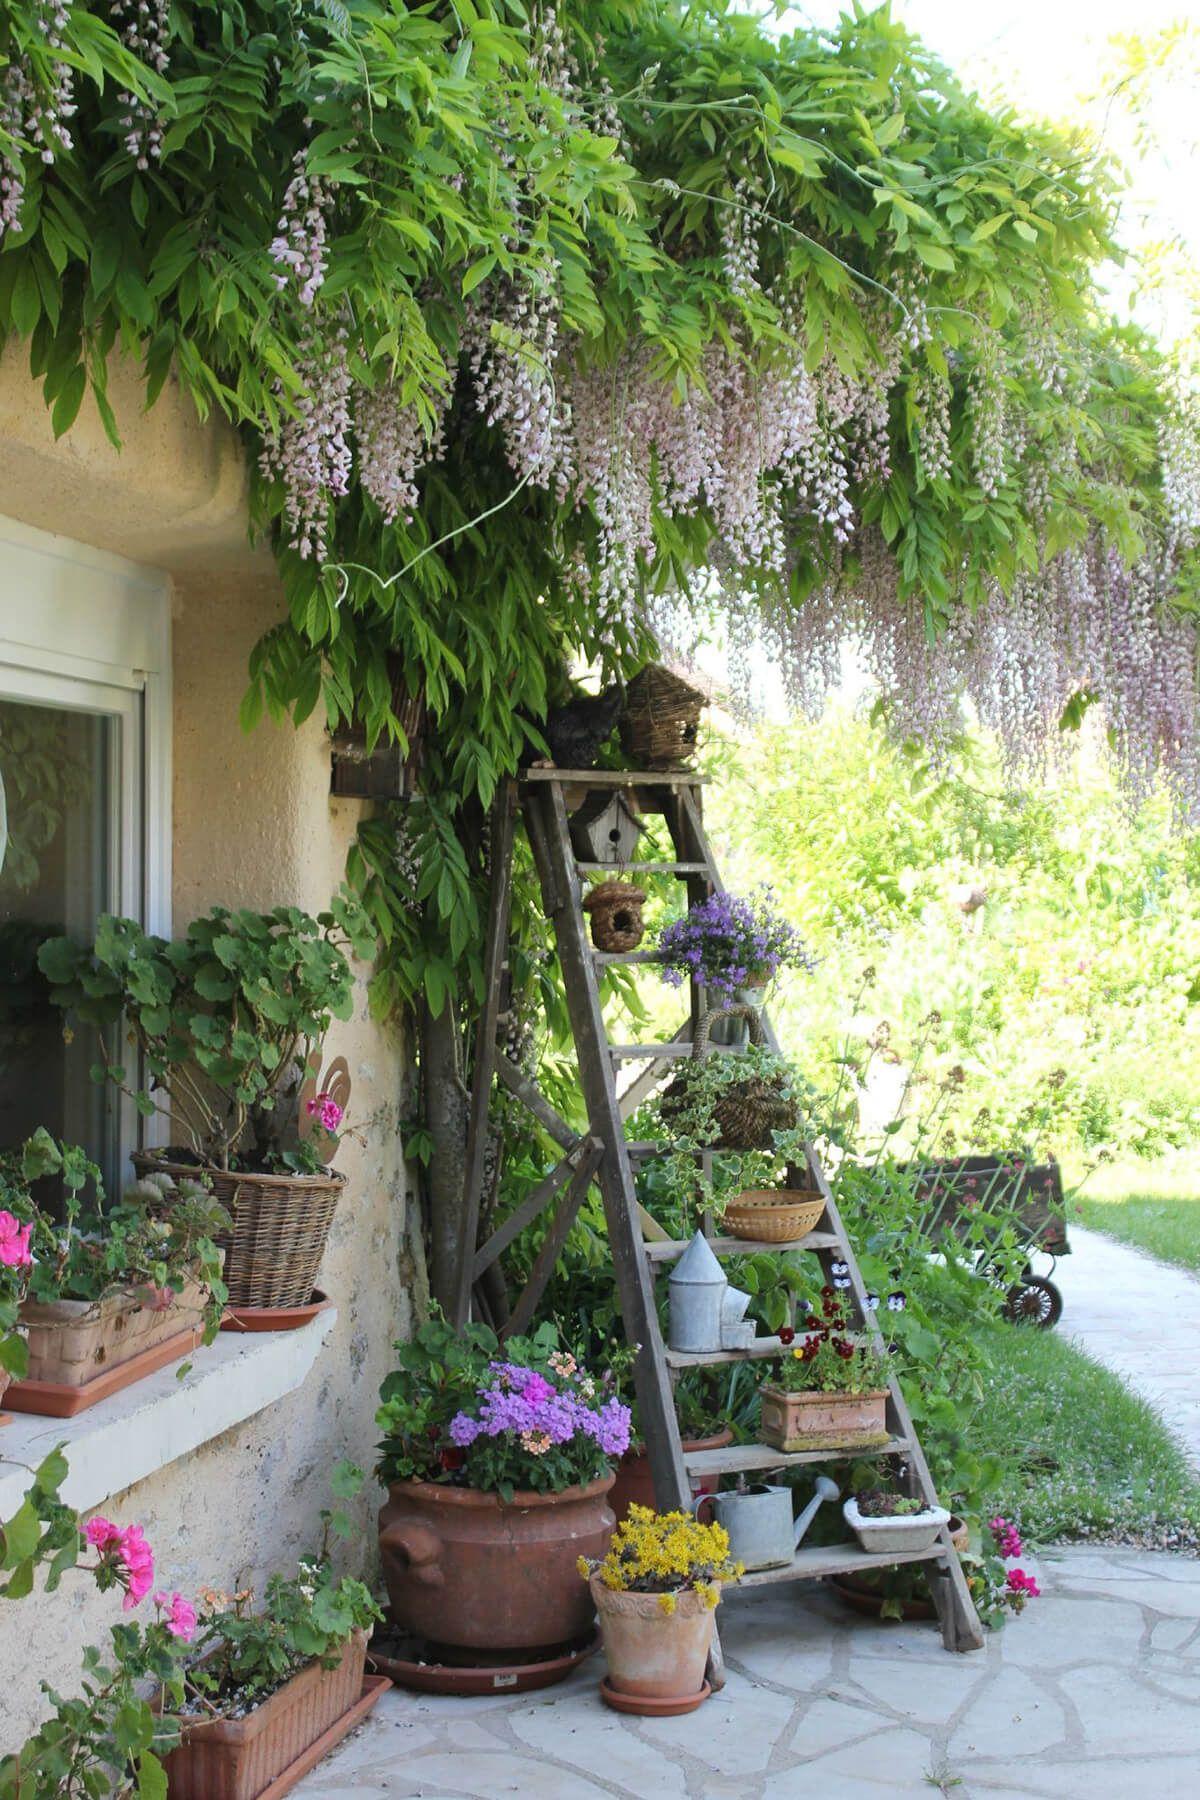 Rostige Gartendeko Elegant Decorare Il Giardino In Modo Creativo 20 Idee Affascinante